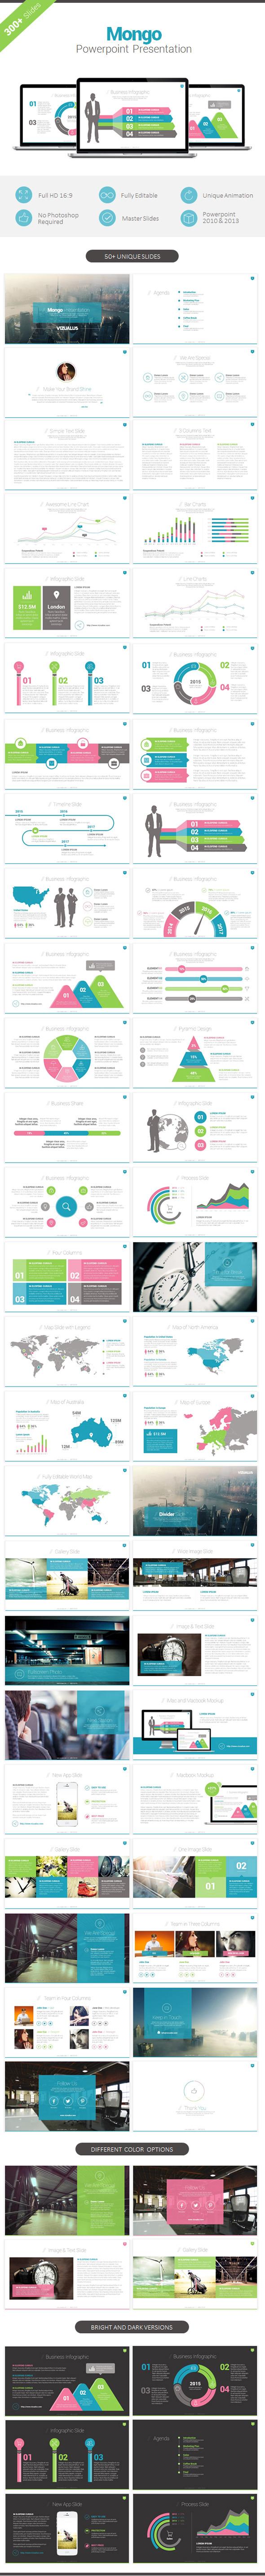 Mongo Powerpoint Template - PowerPoint Templates Presentation Templates